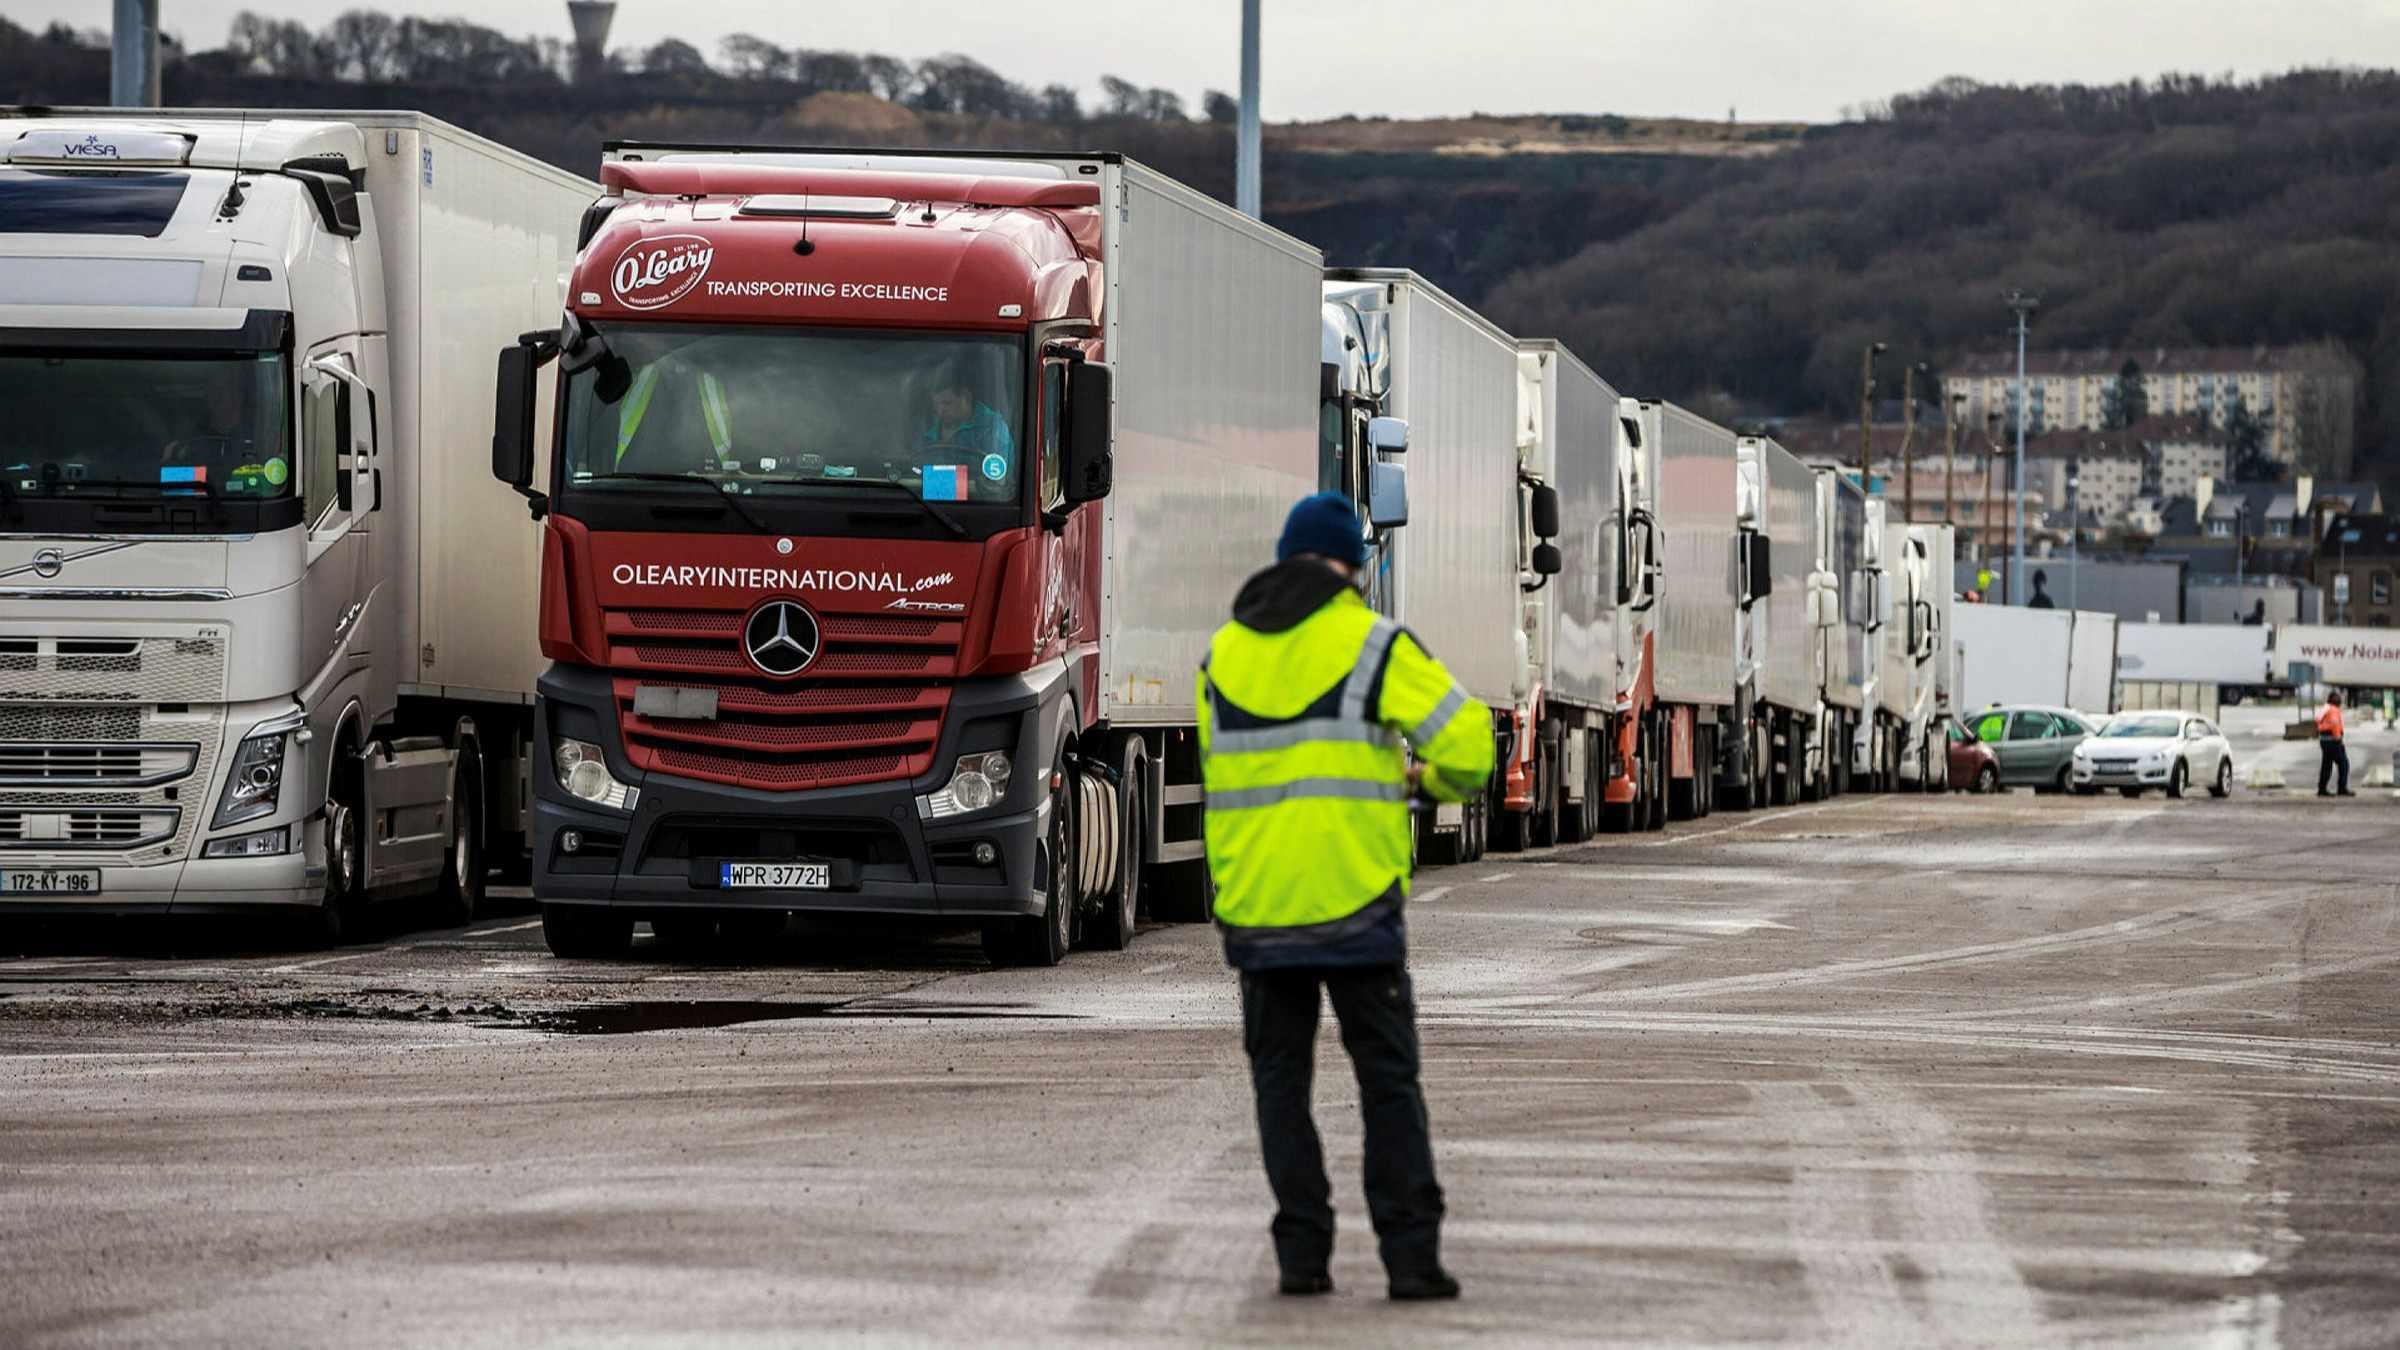 brexit trade disruption fuels boom